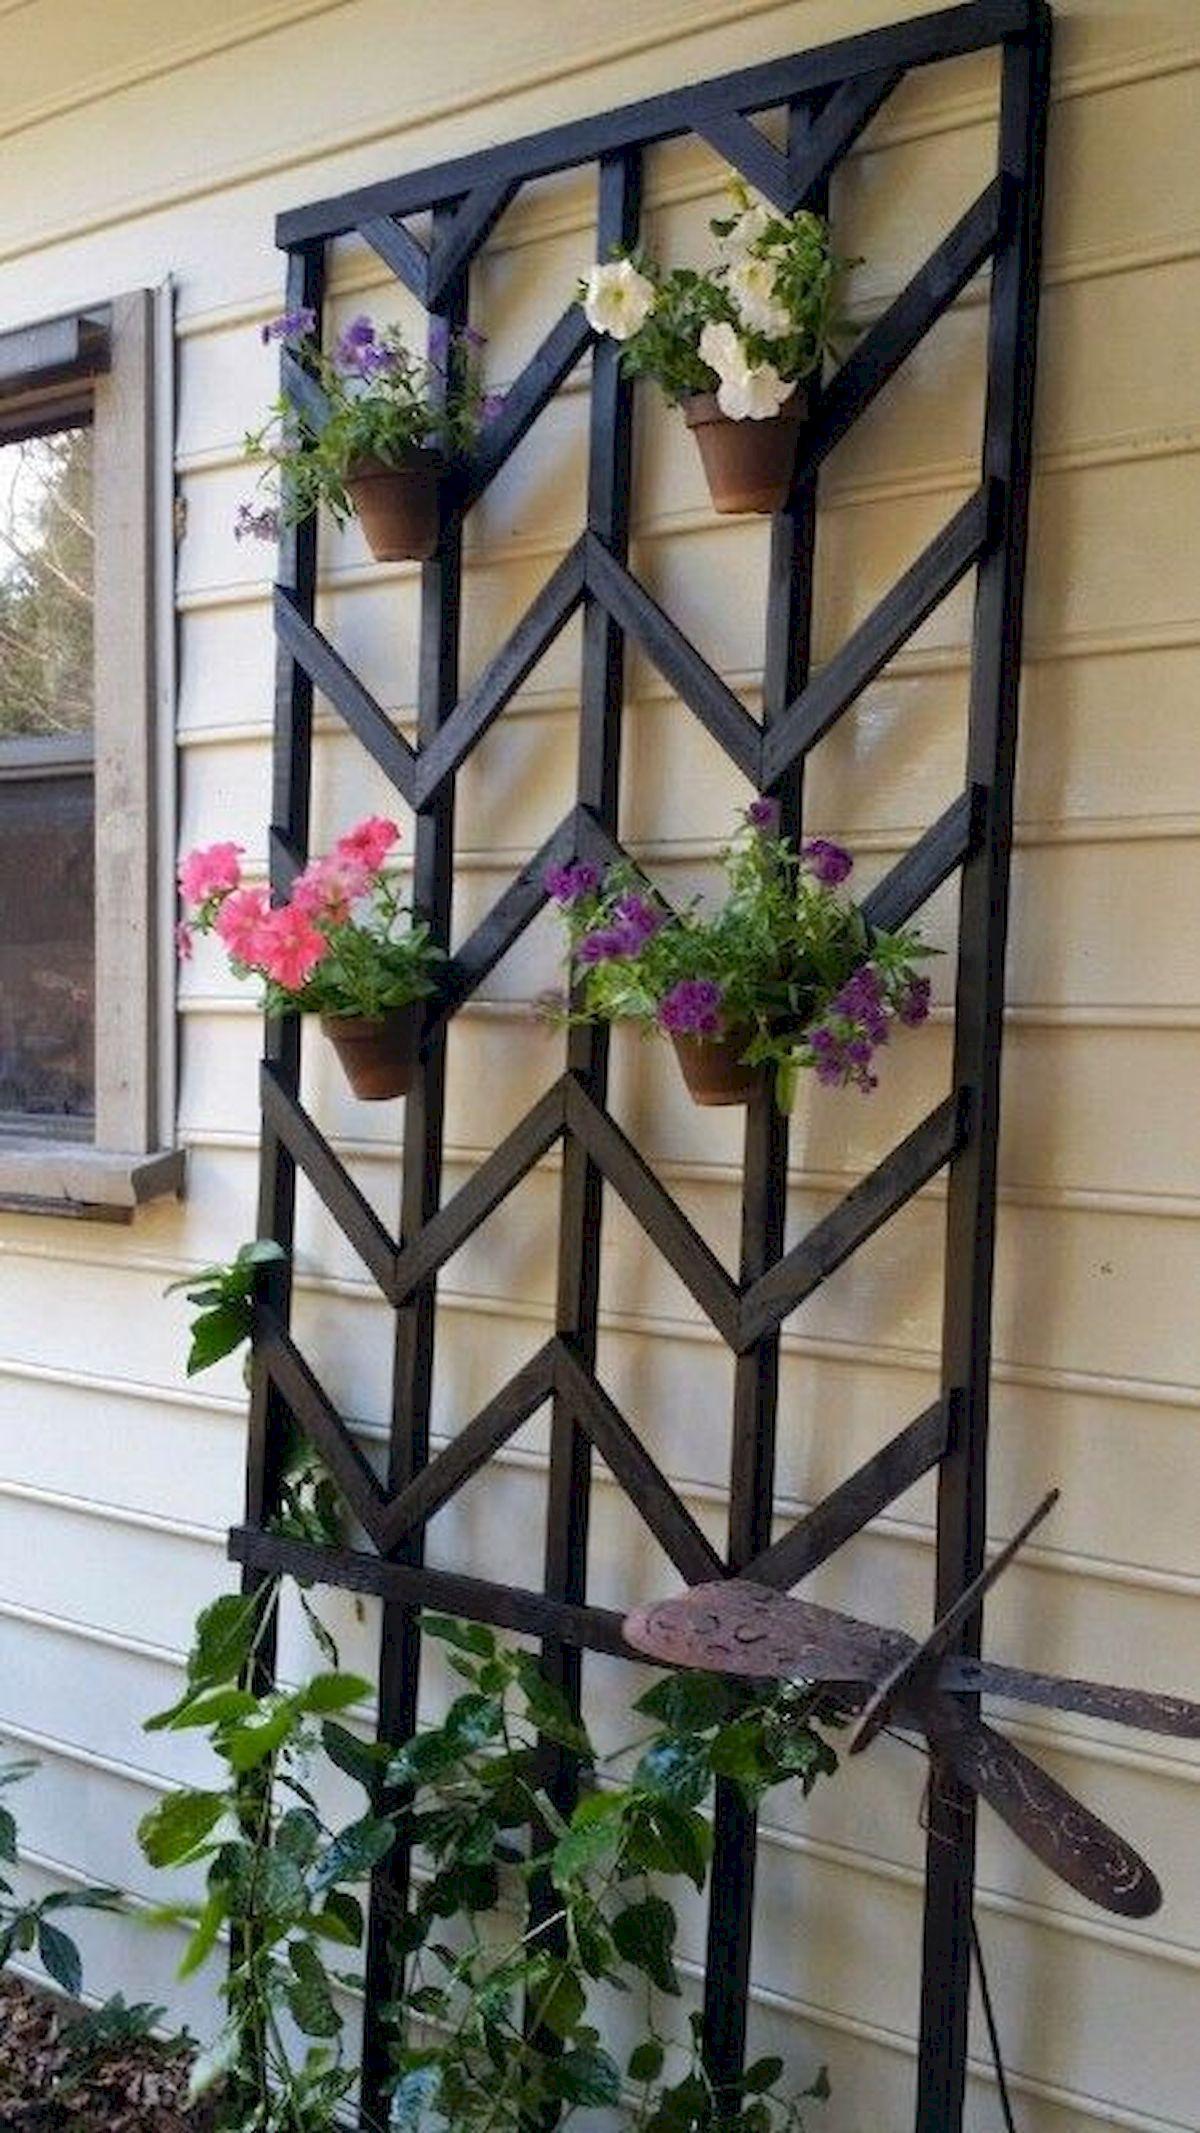 Diy chevron lattice trellis Functional DIY Trellis Ideas To Beautify Your Garden In Style